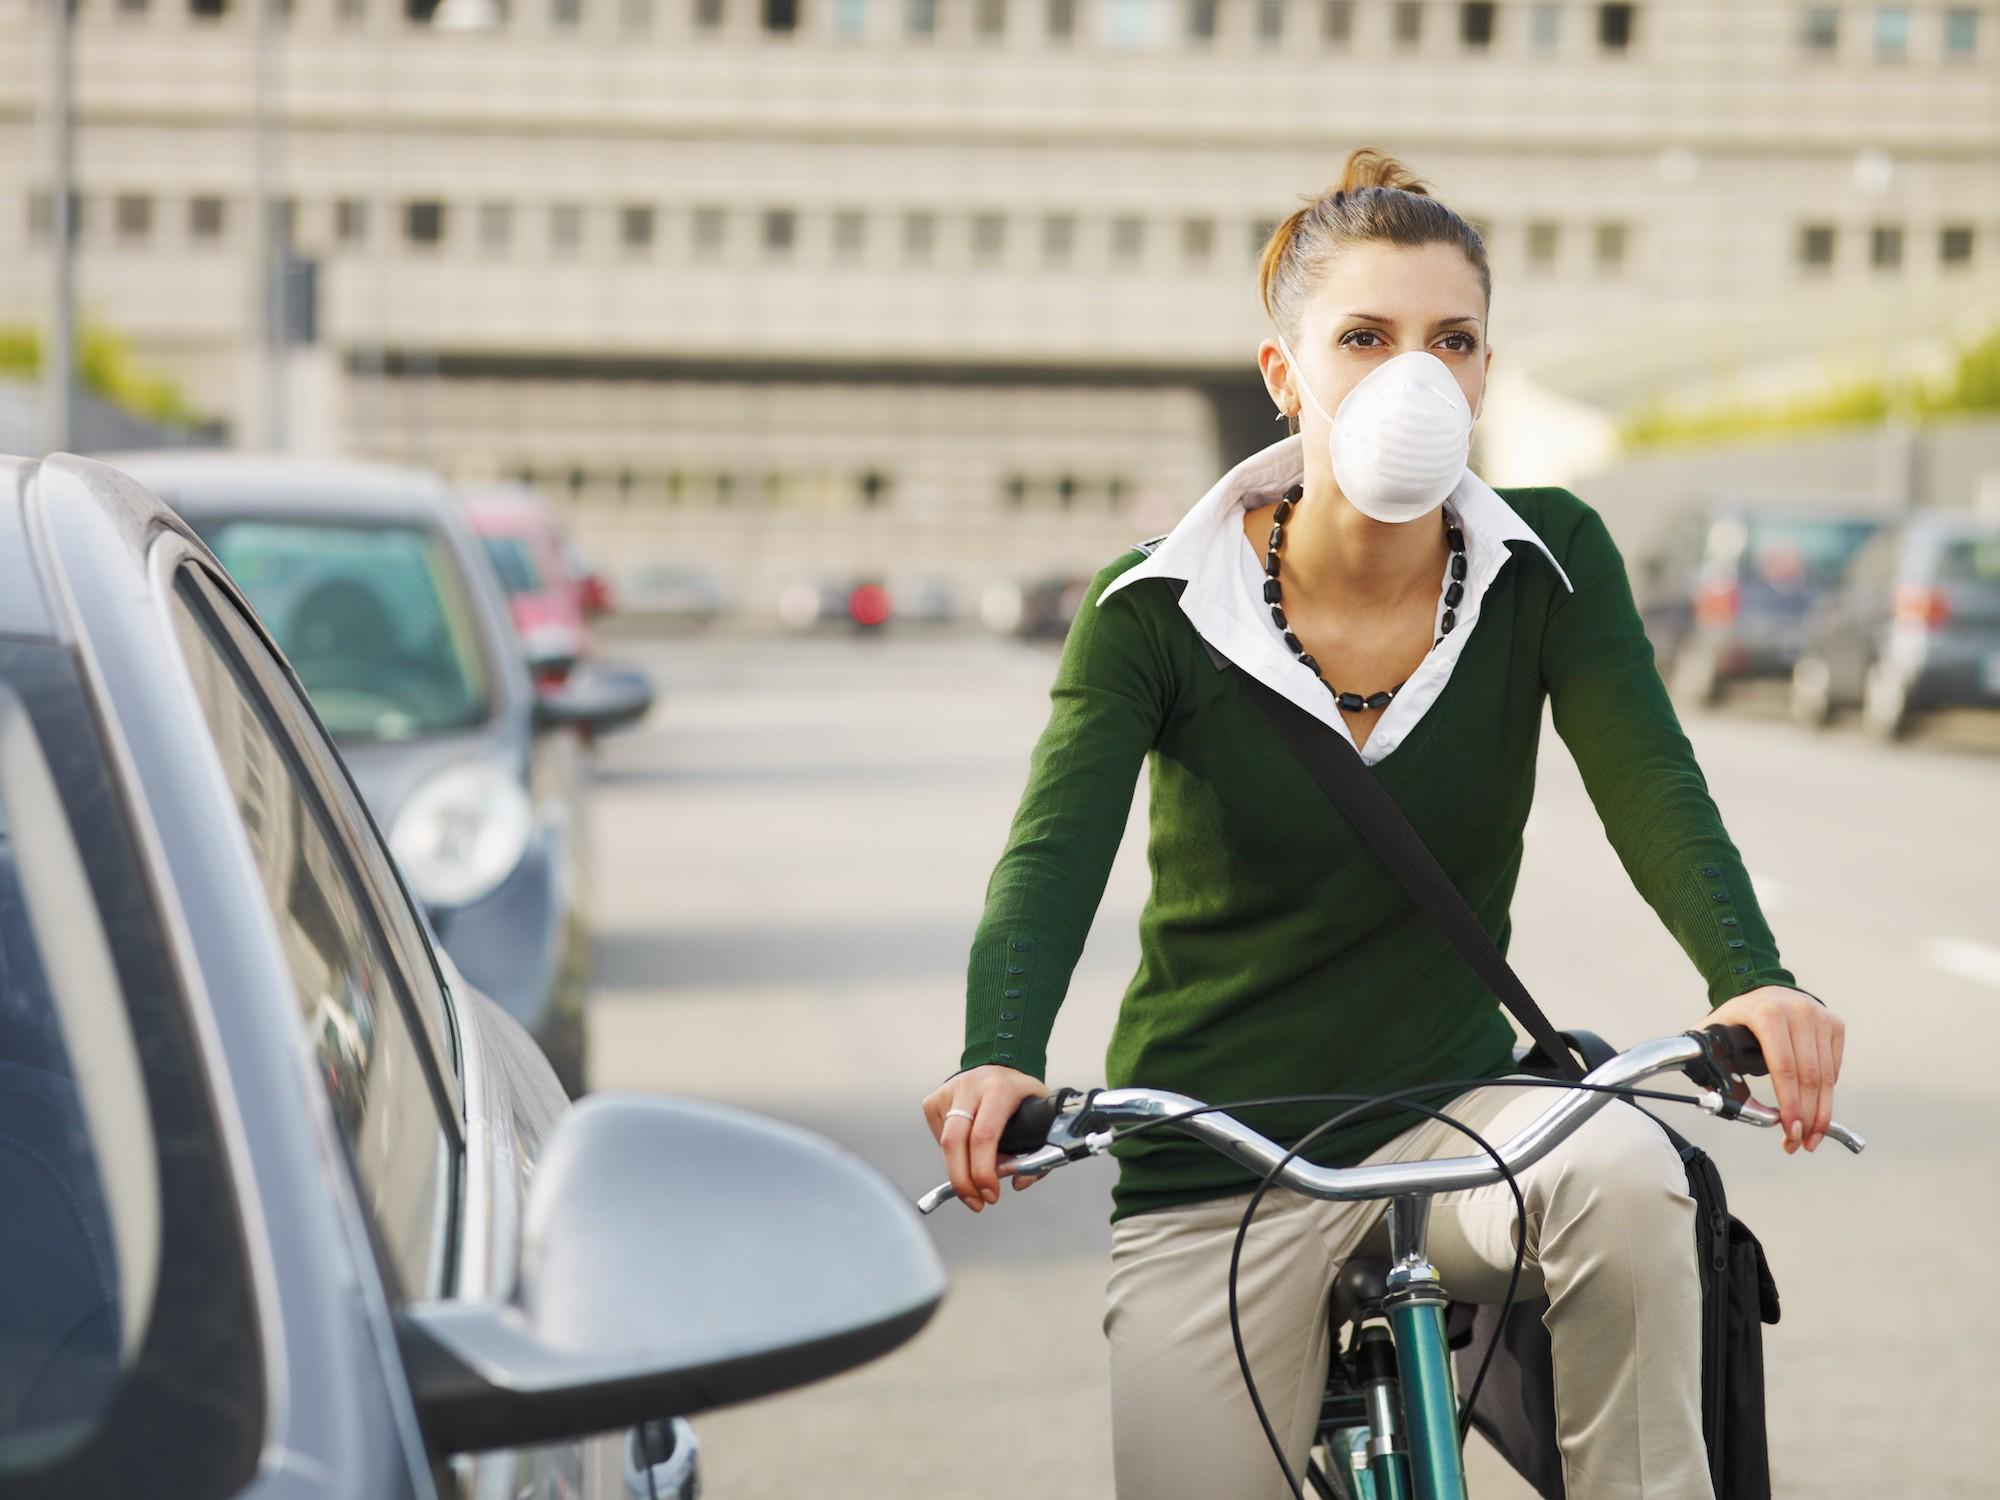 Tosse cronica, è lo smog?